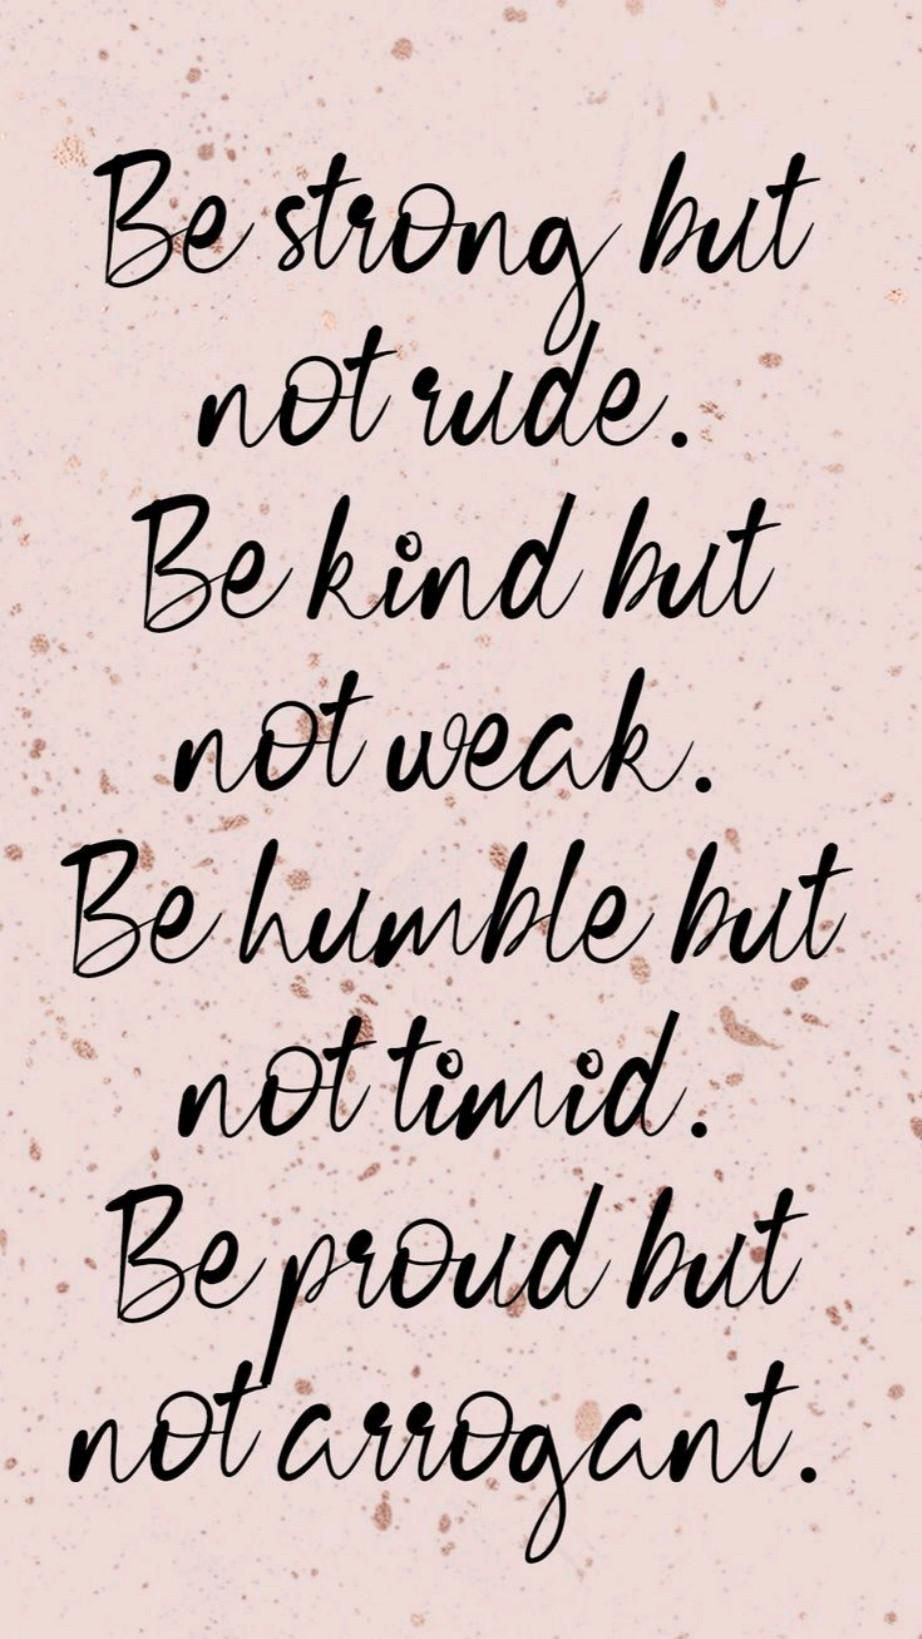 #motivational quote#jvmew21